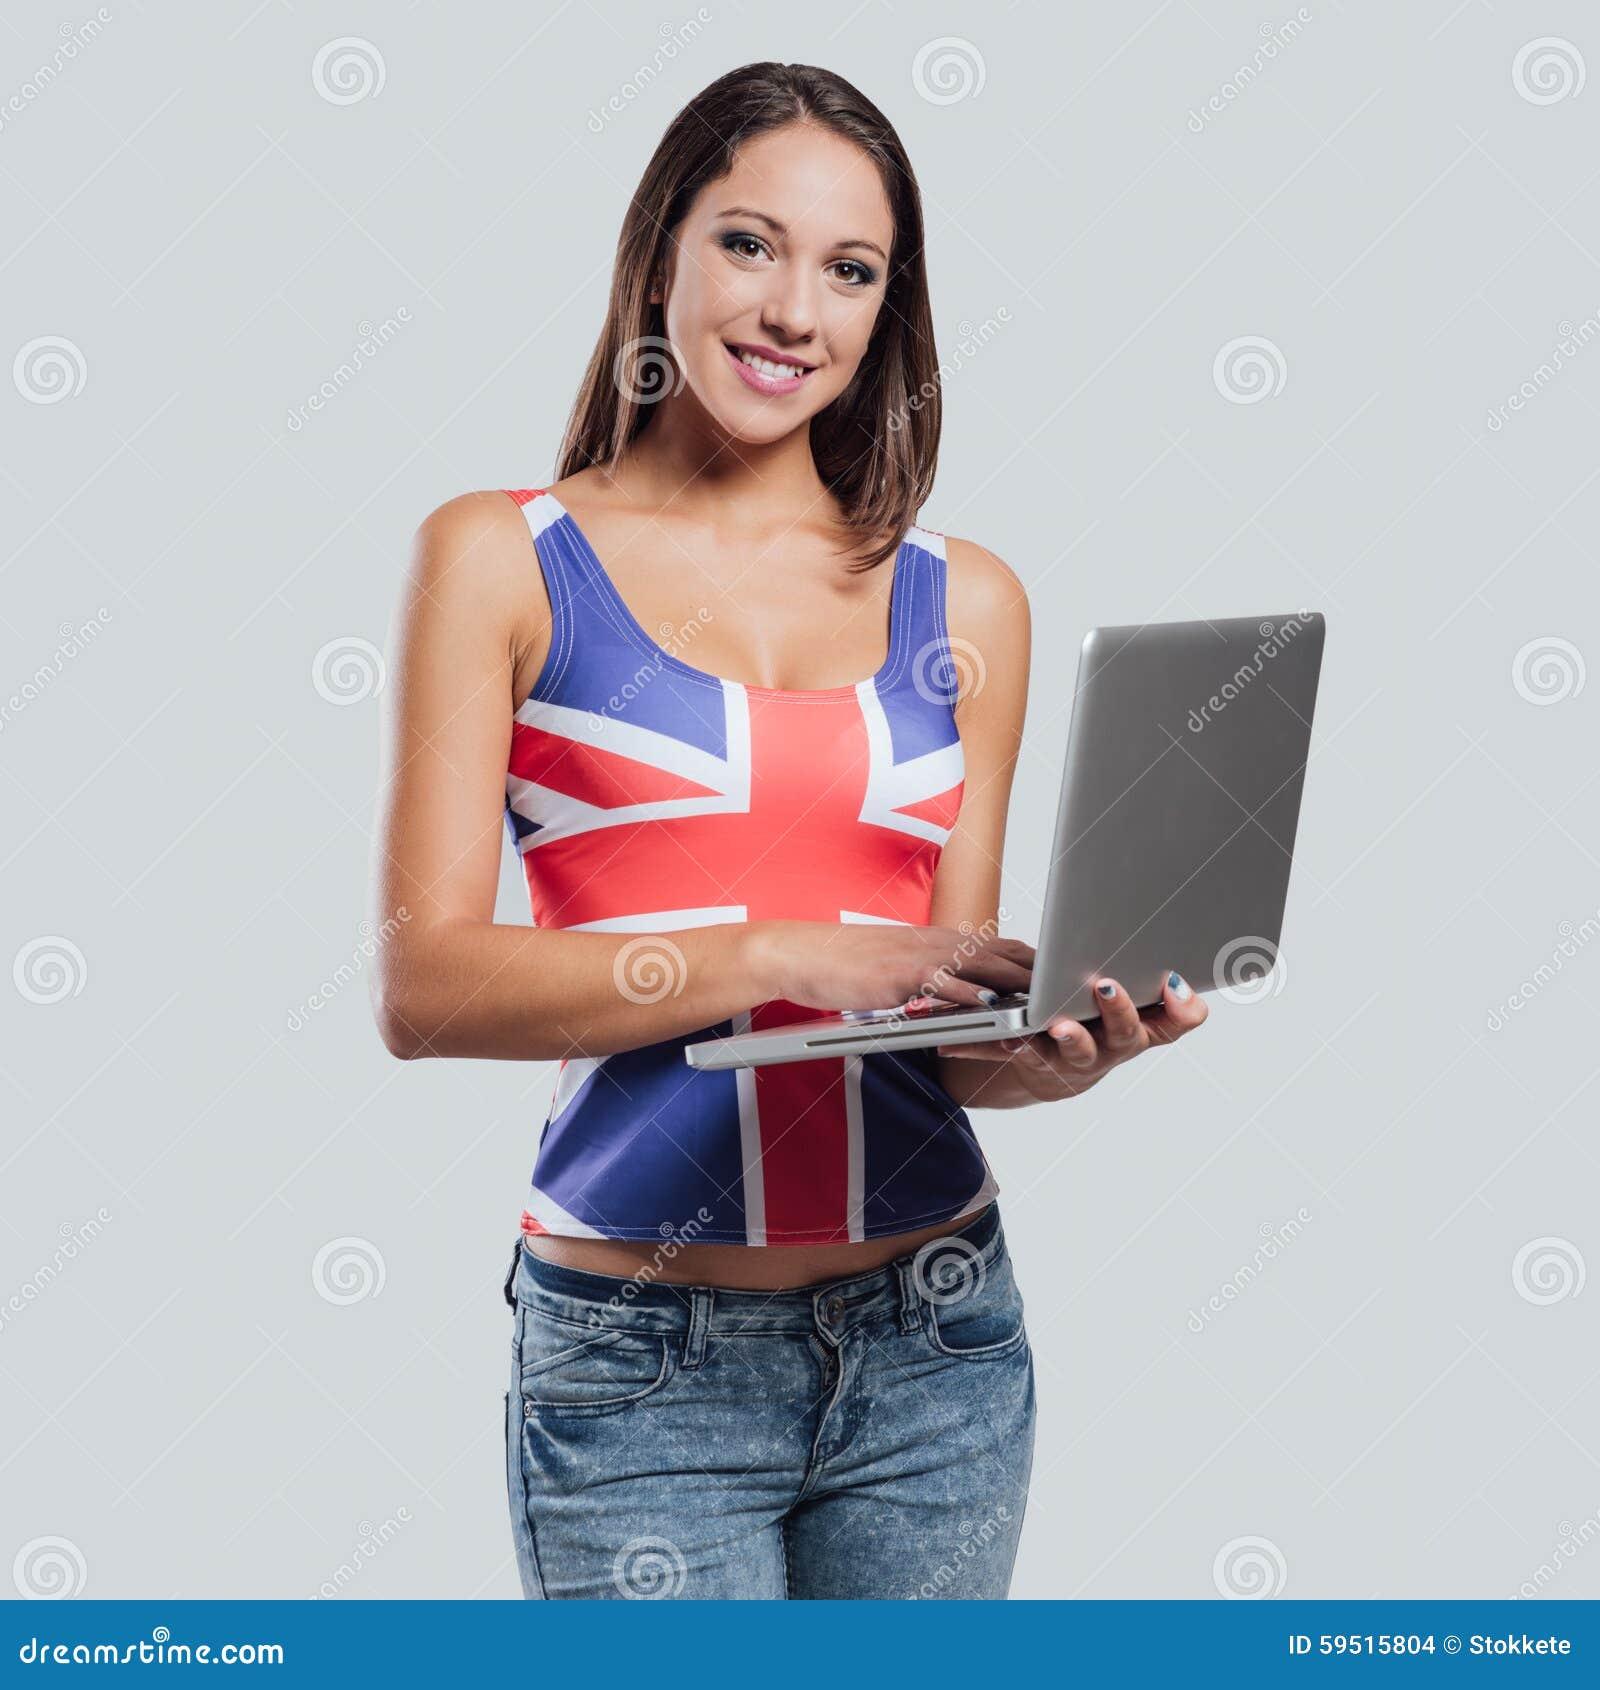 British girl lesbian photo 64